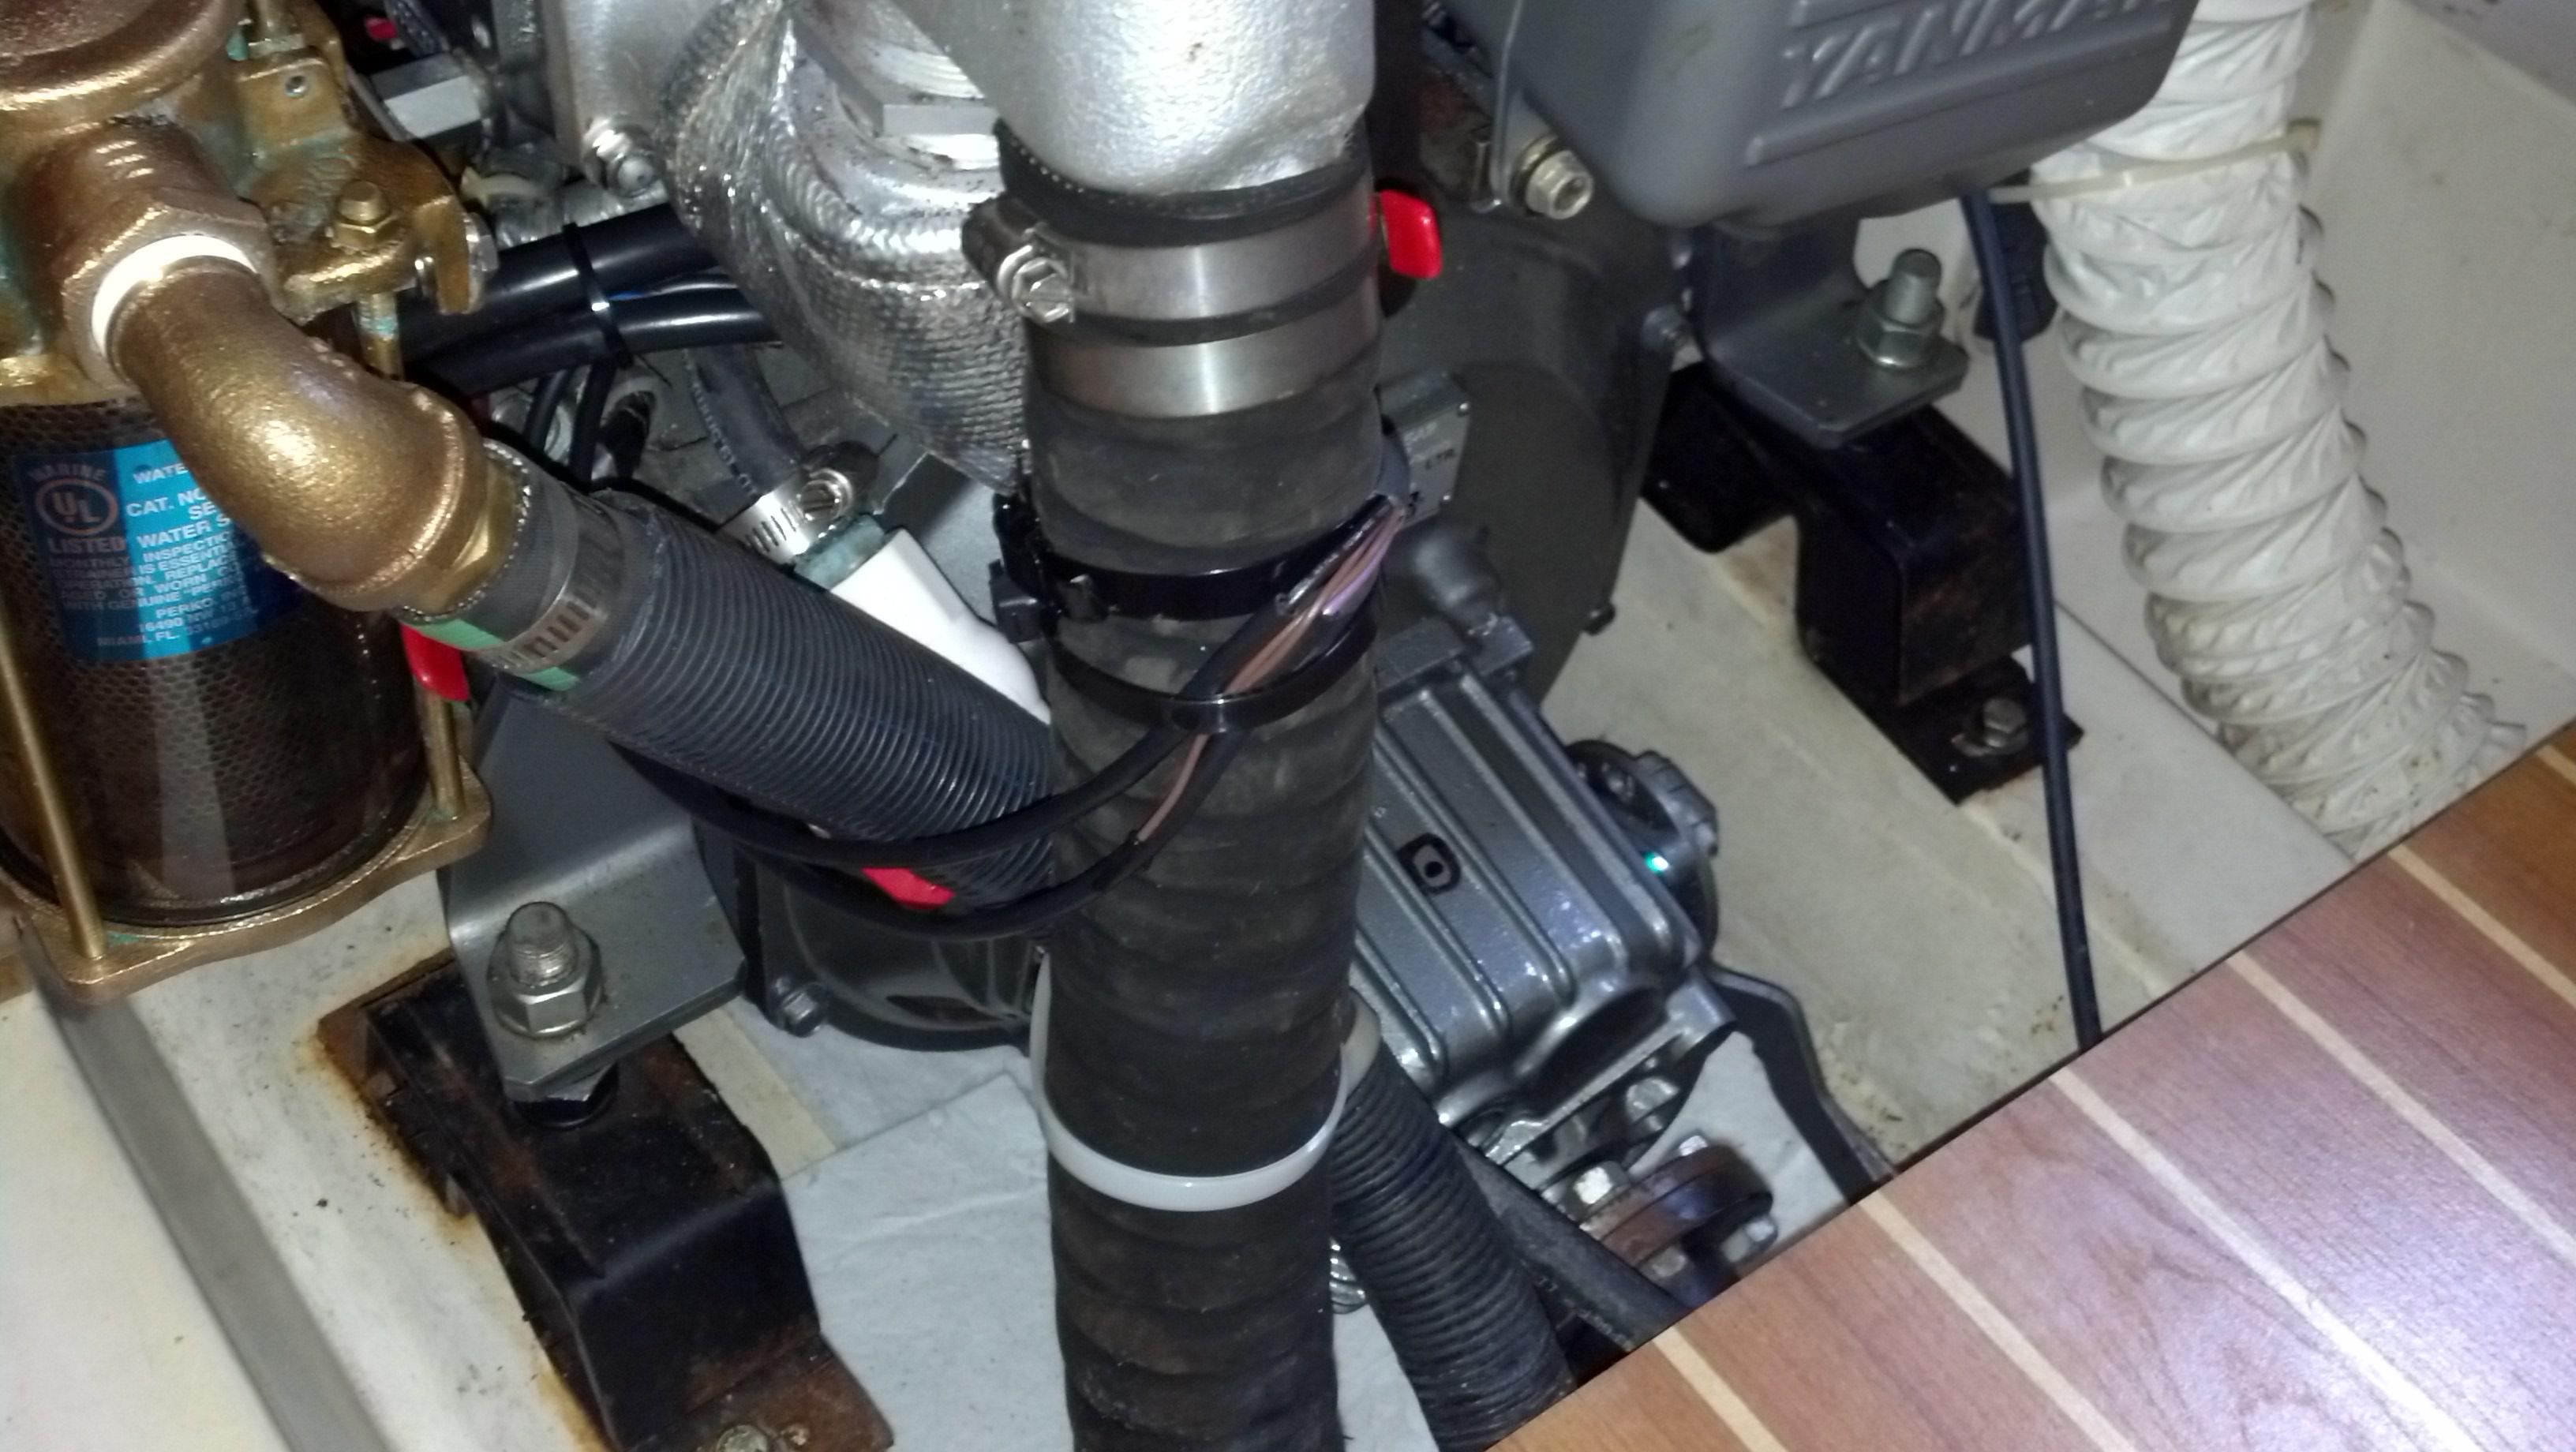 Engine Temperature Alarms Catalina 36 375 International Association Car Overheating Alarm Attachments